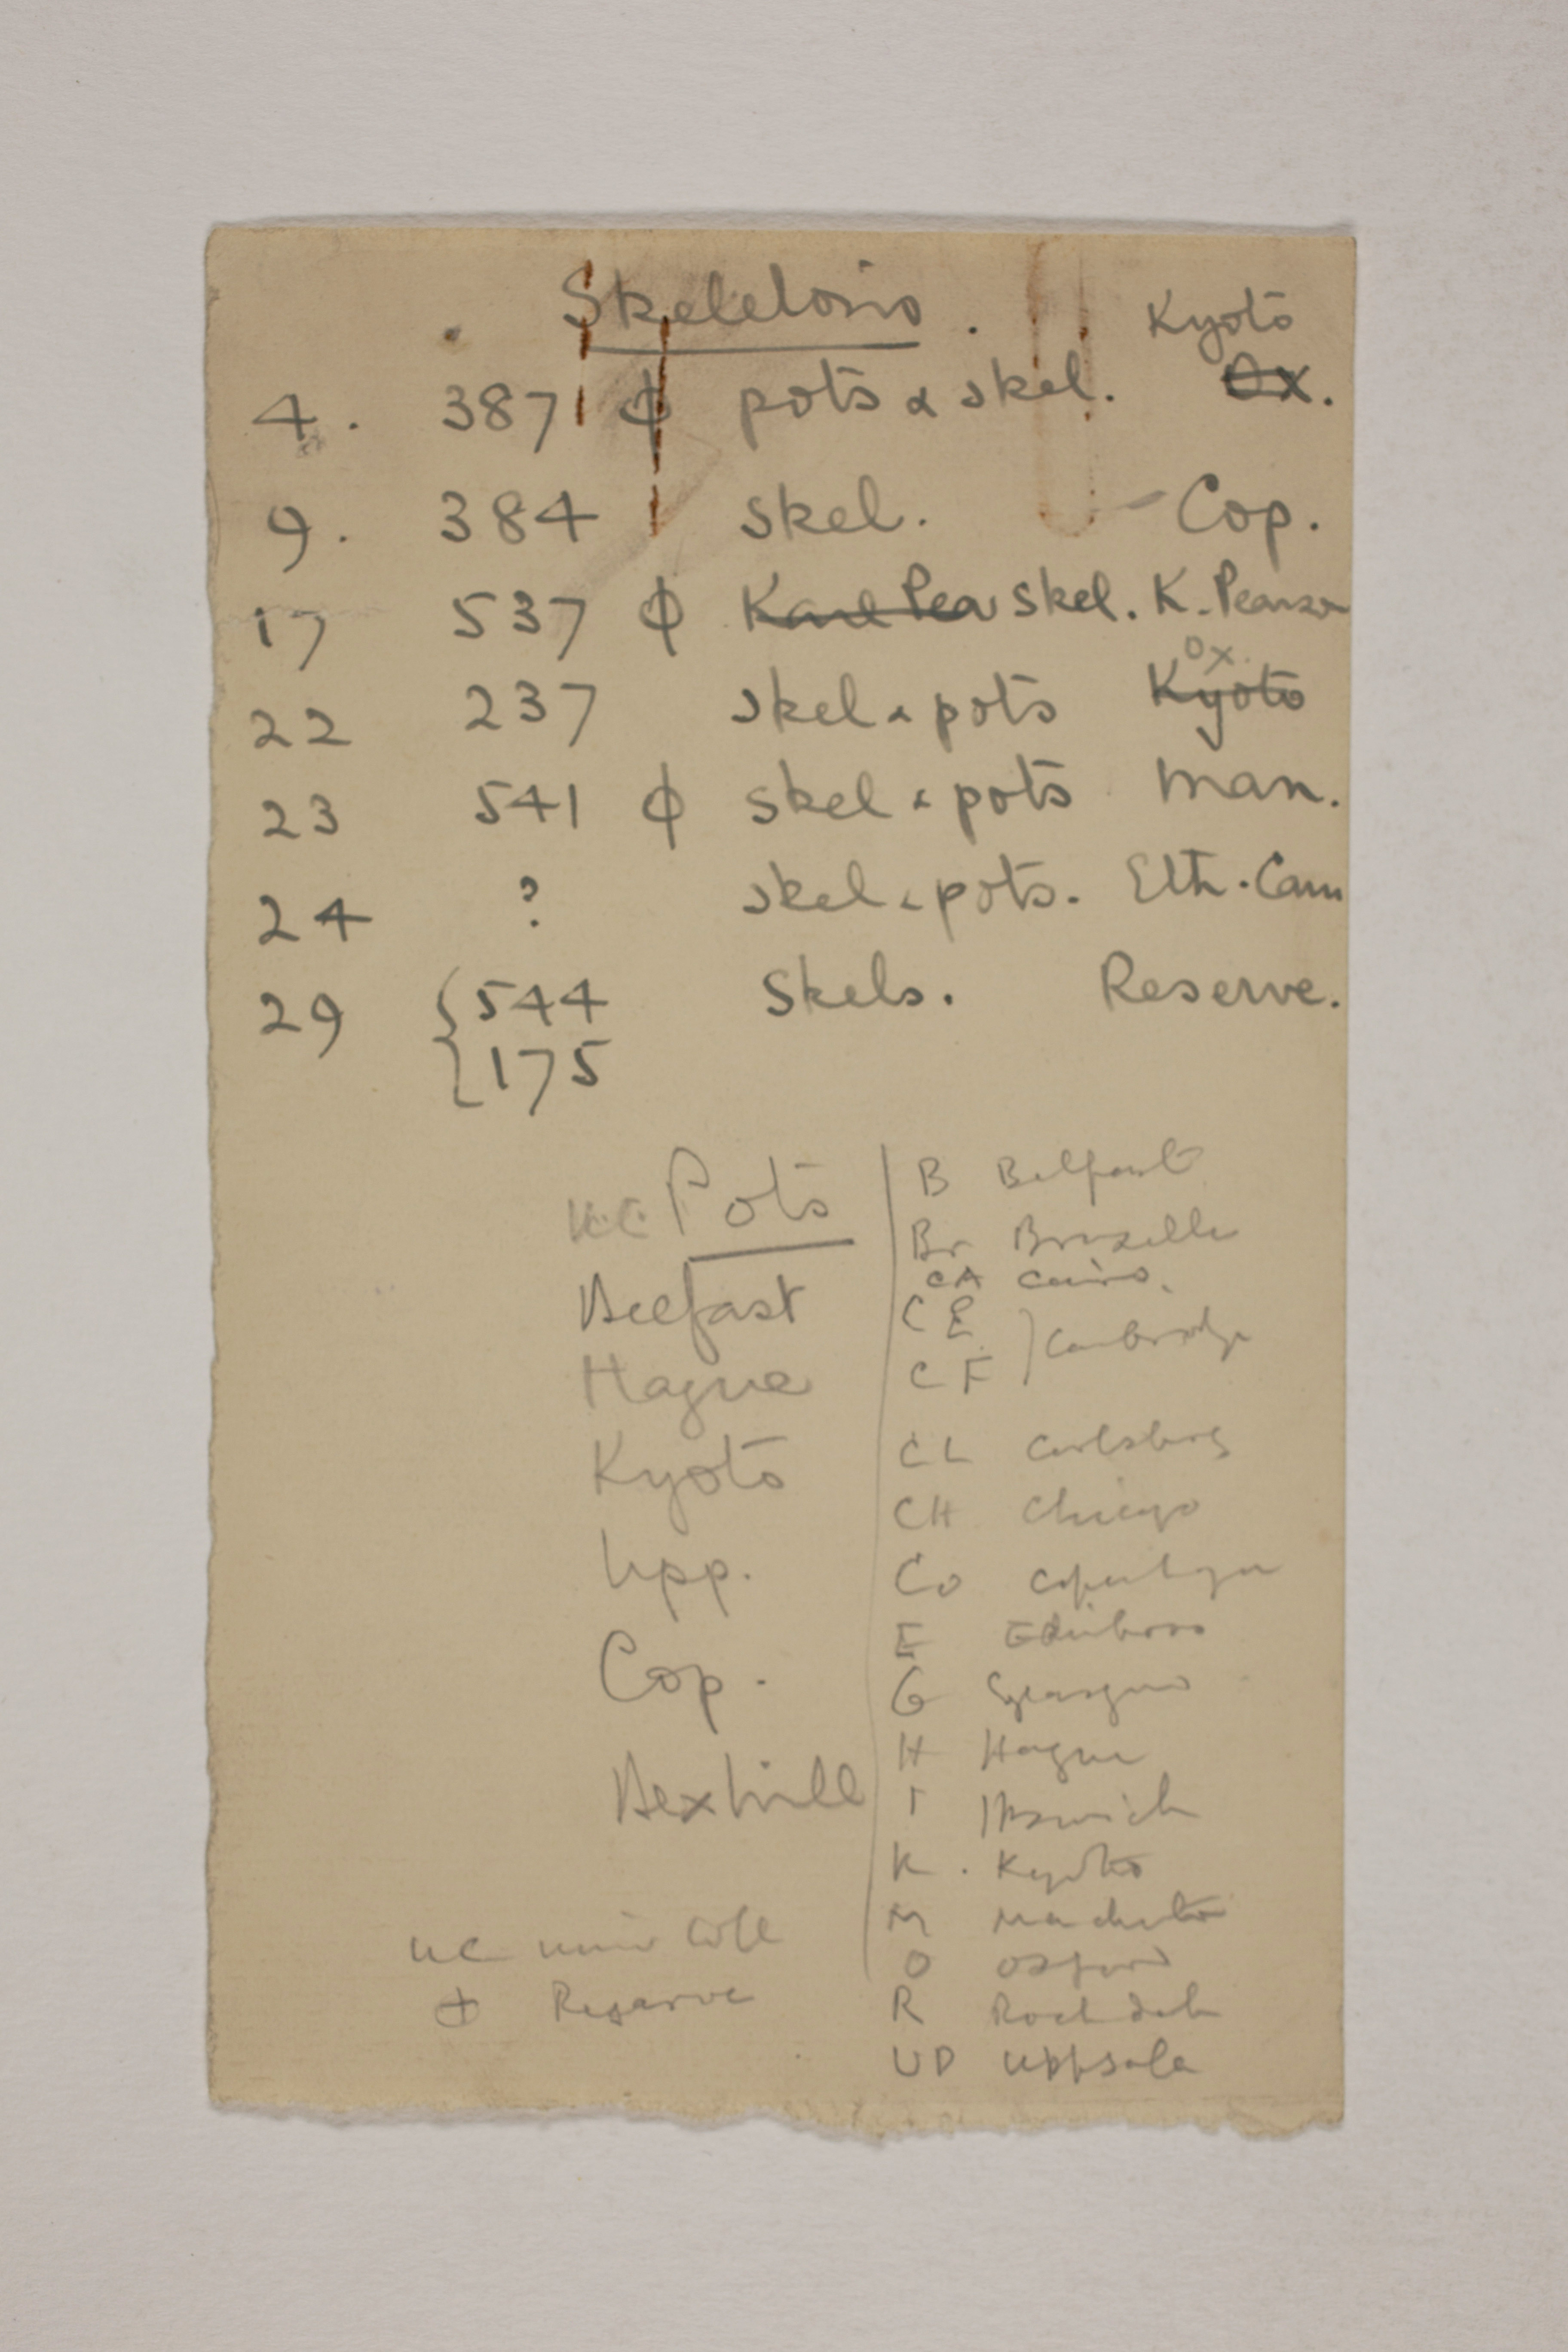 1913-14 Lahun, Haraga Object list PMA/WFP1/D/22/12